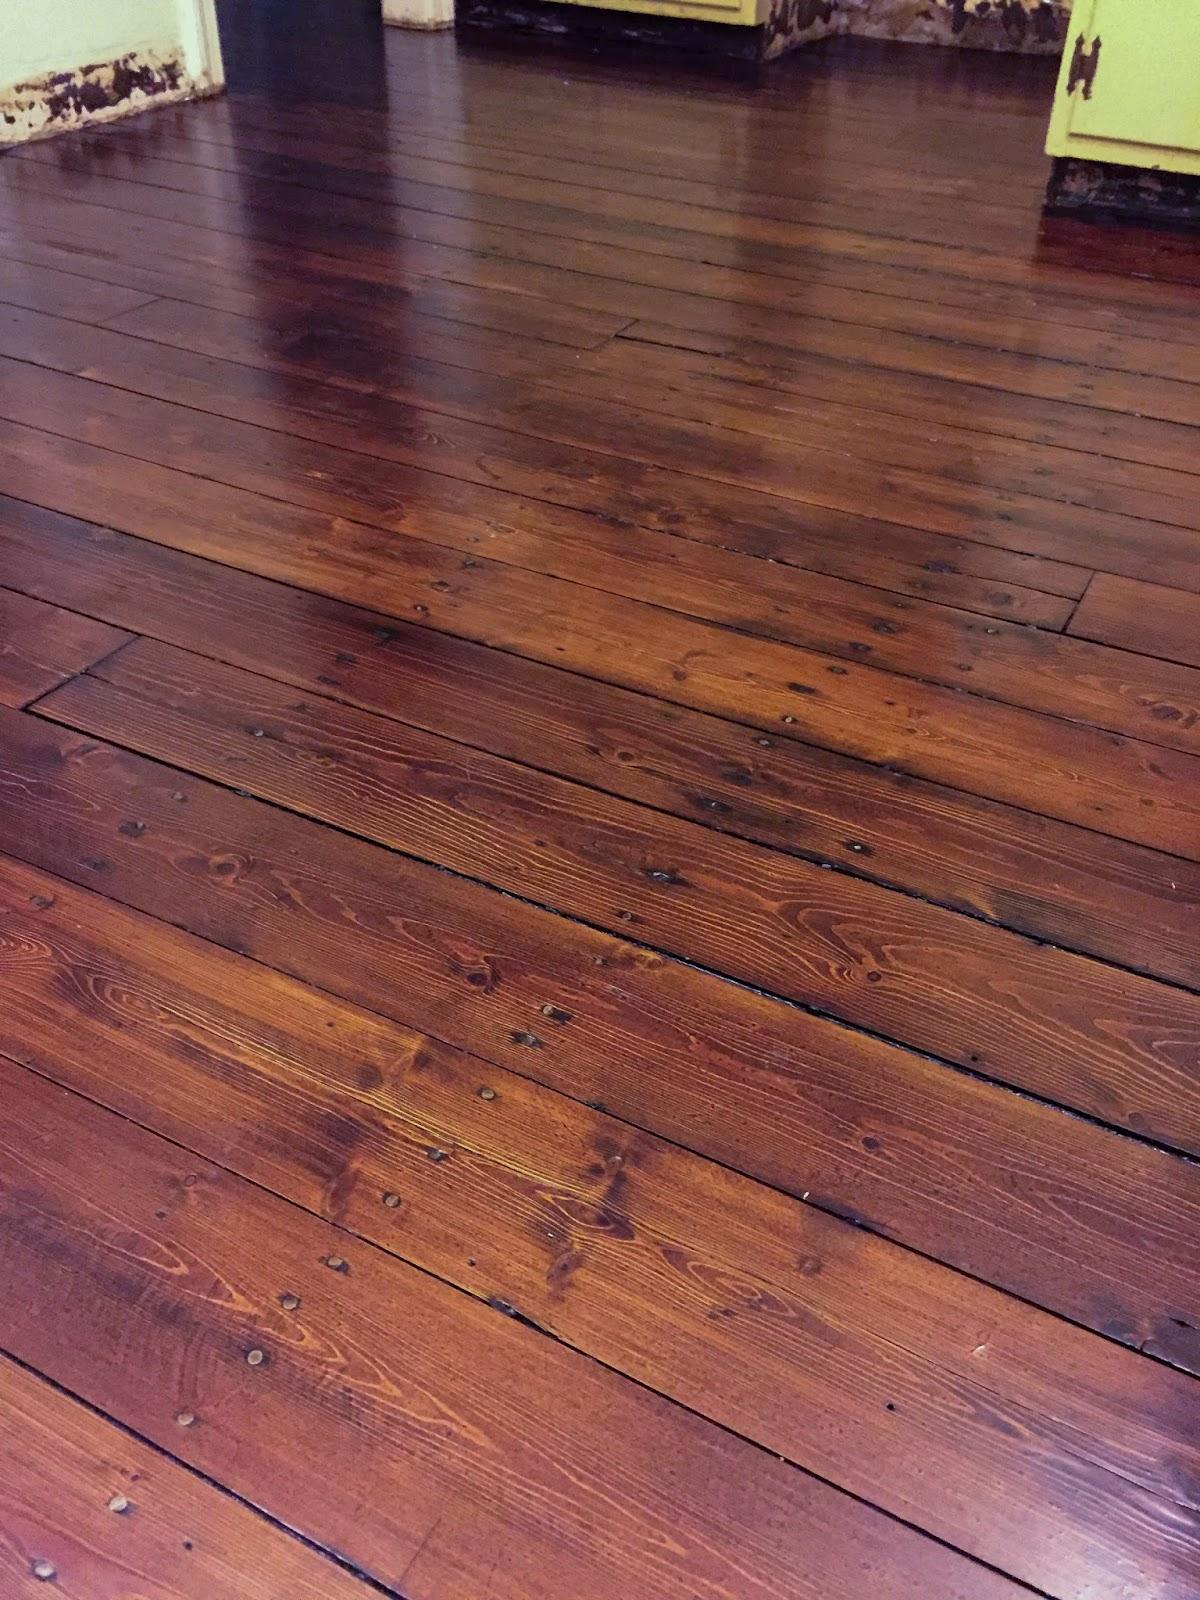 Restoring Hardwood Floors